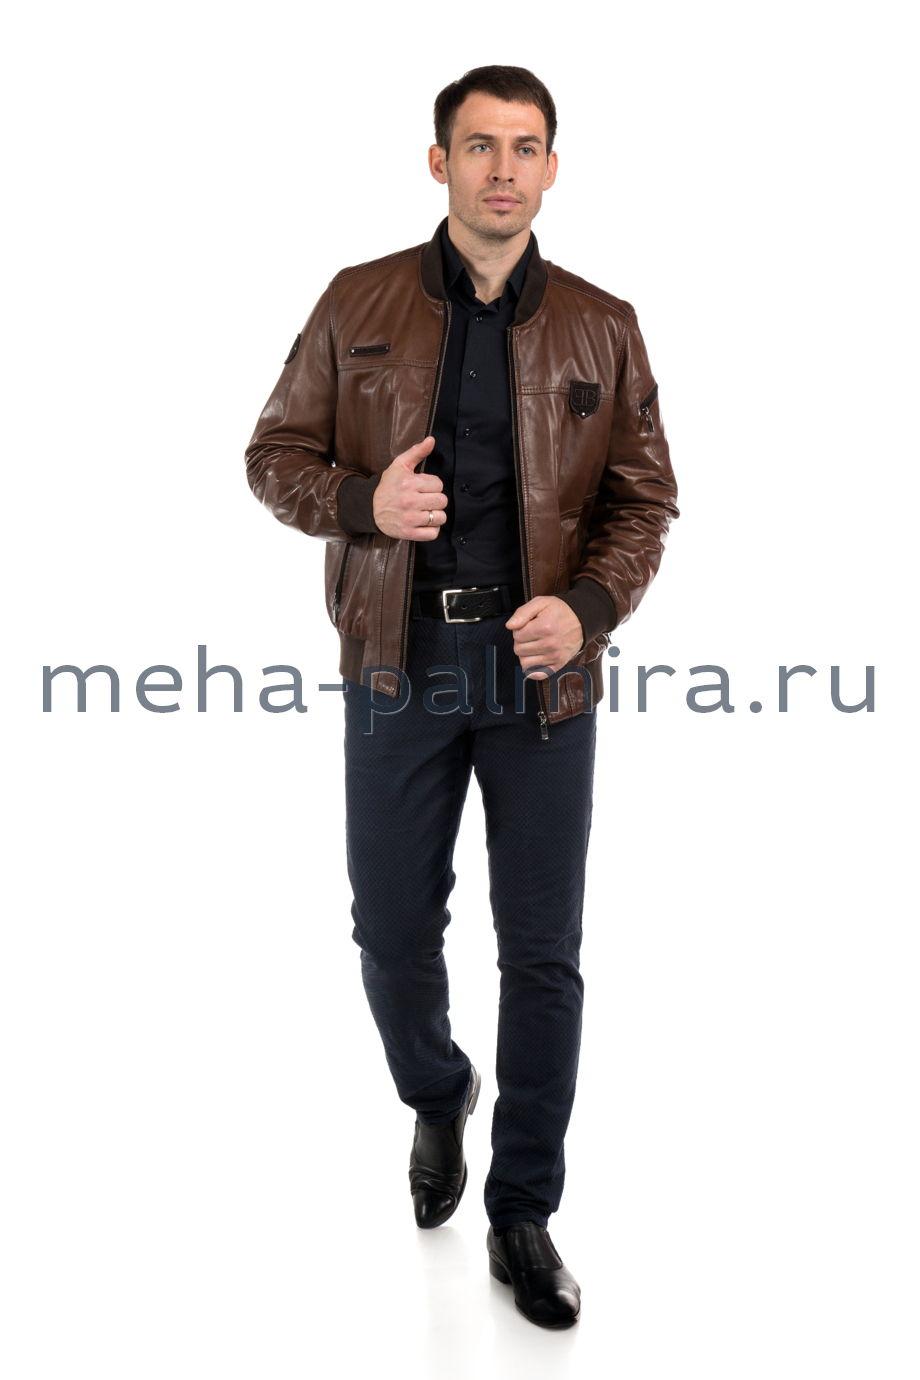 Куртка - бомбер на молнии, цвет кэмел, Италия